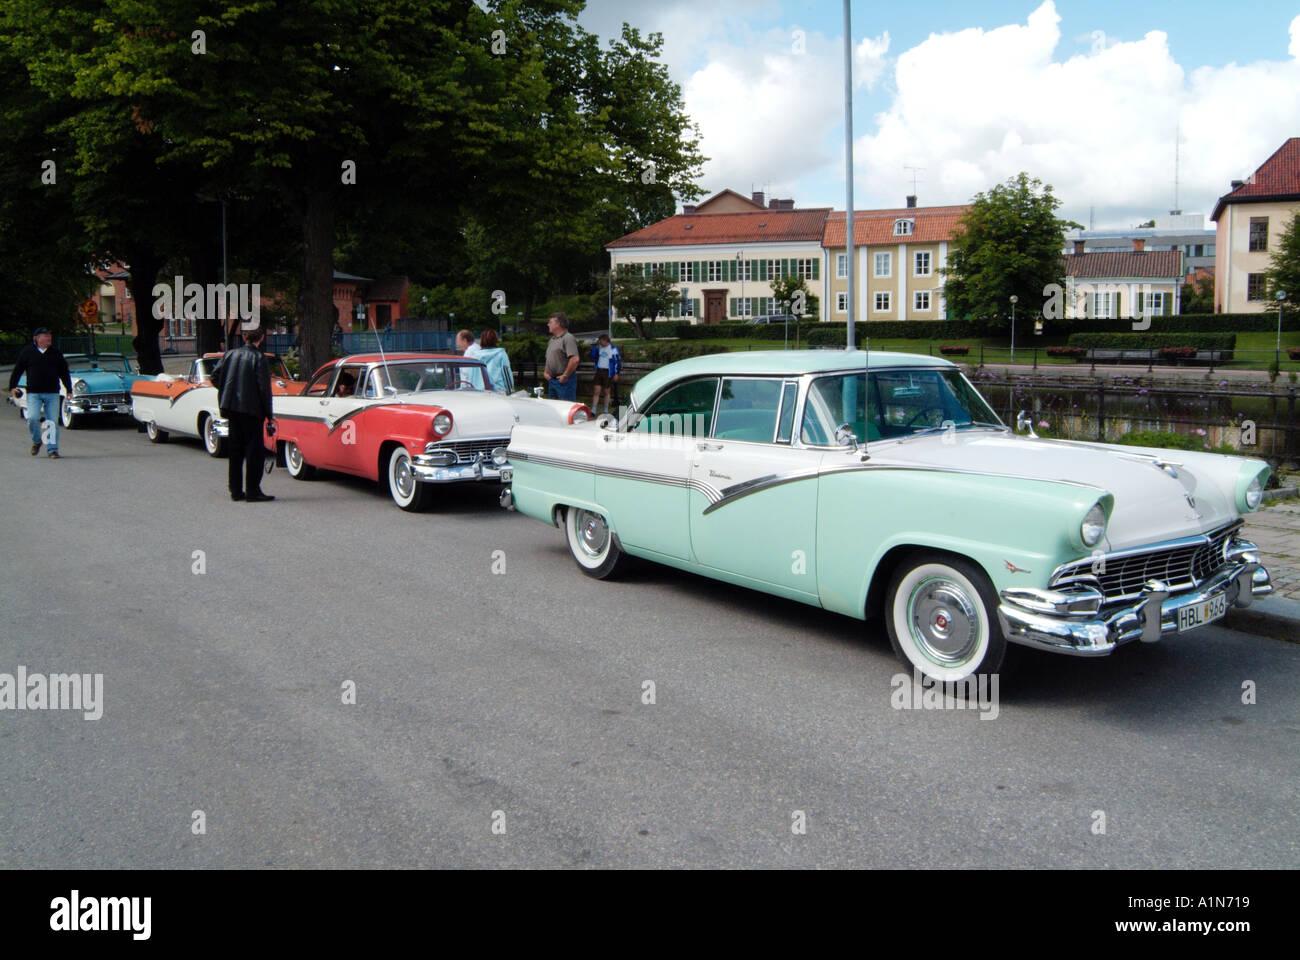 1956 ford car classic chrome fin ford motor company FoMoCo v8 engine american us usa america & Ford Motor Company Usa Stock Photos u0026 Ford Motor Company Usa Stock ... markmcfarlin.com